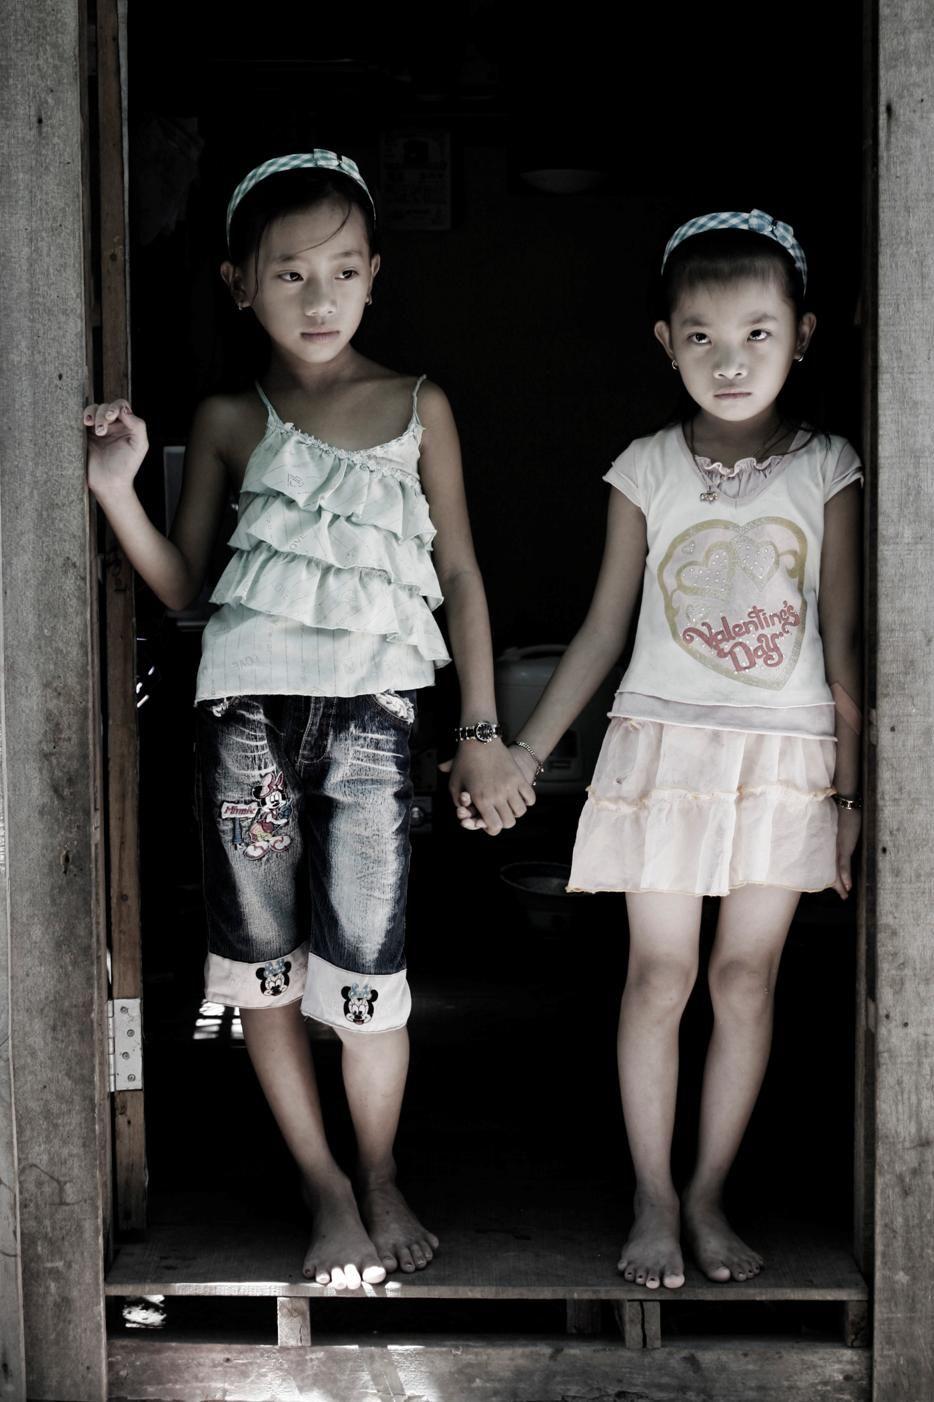 Fighting sex trafficking in Cambodia - CNN Video